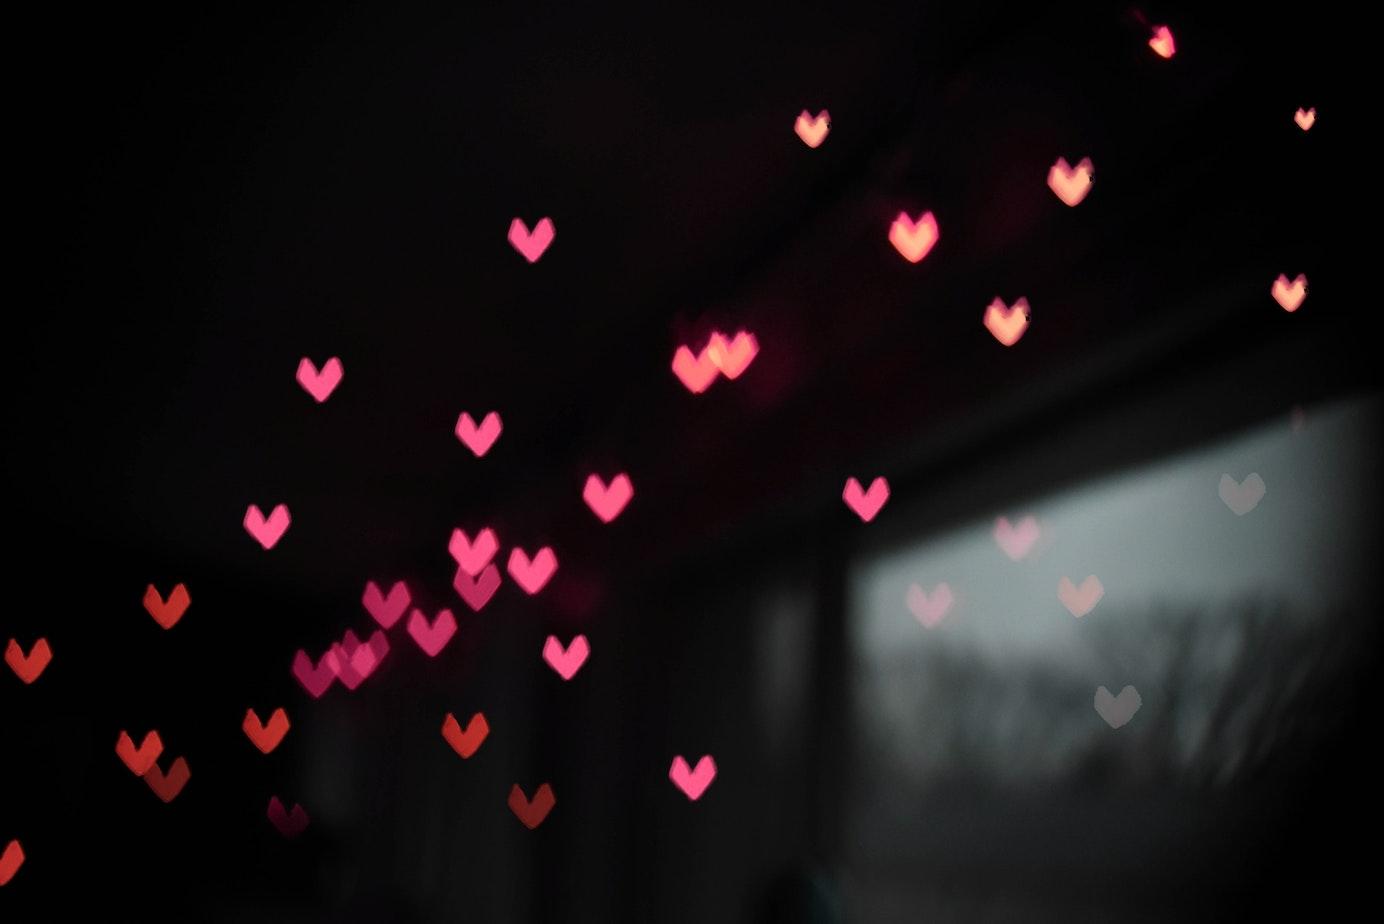 Stop Writing Love - Element5 Digital